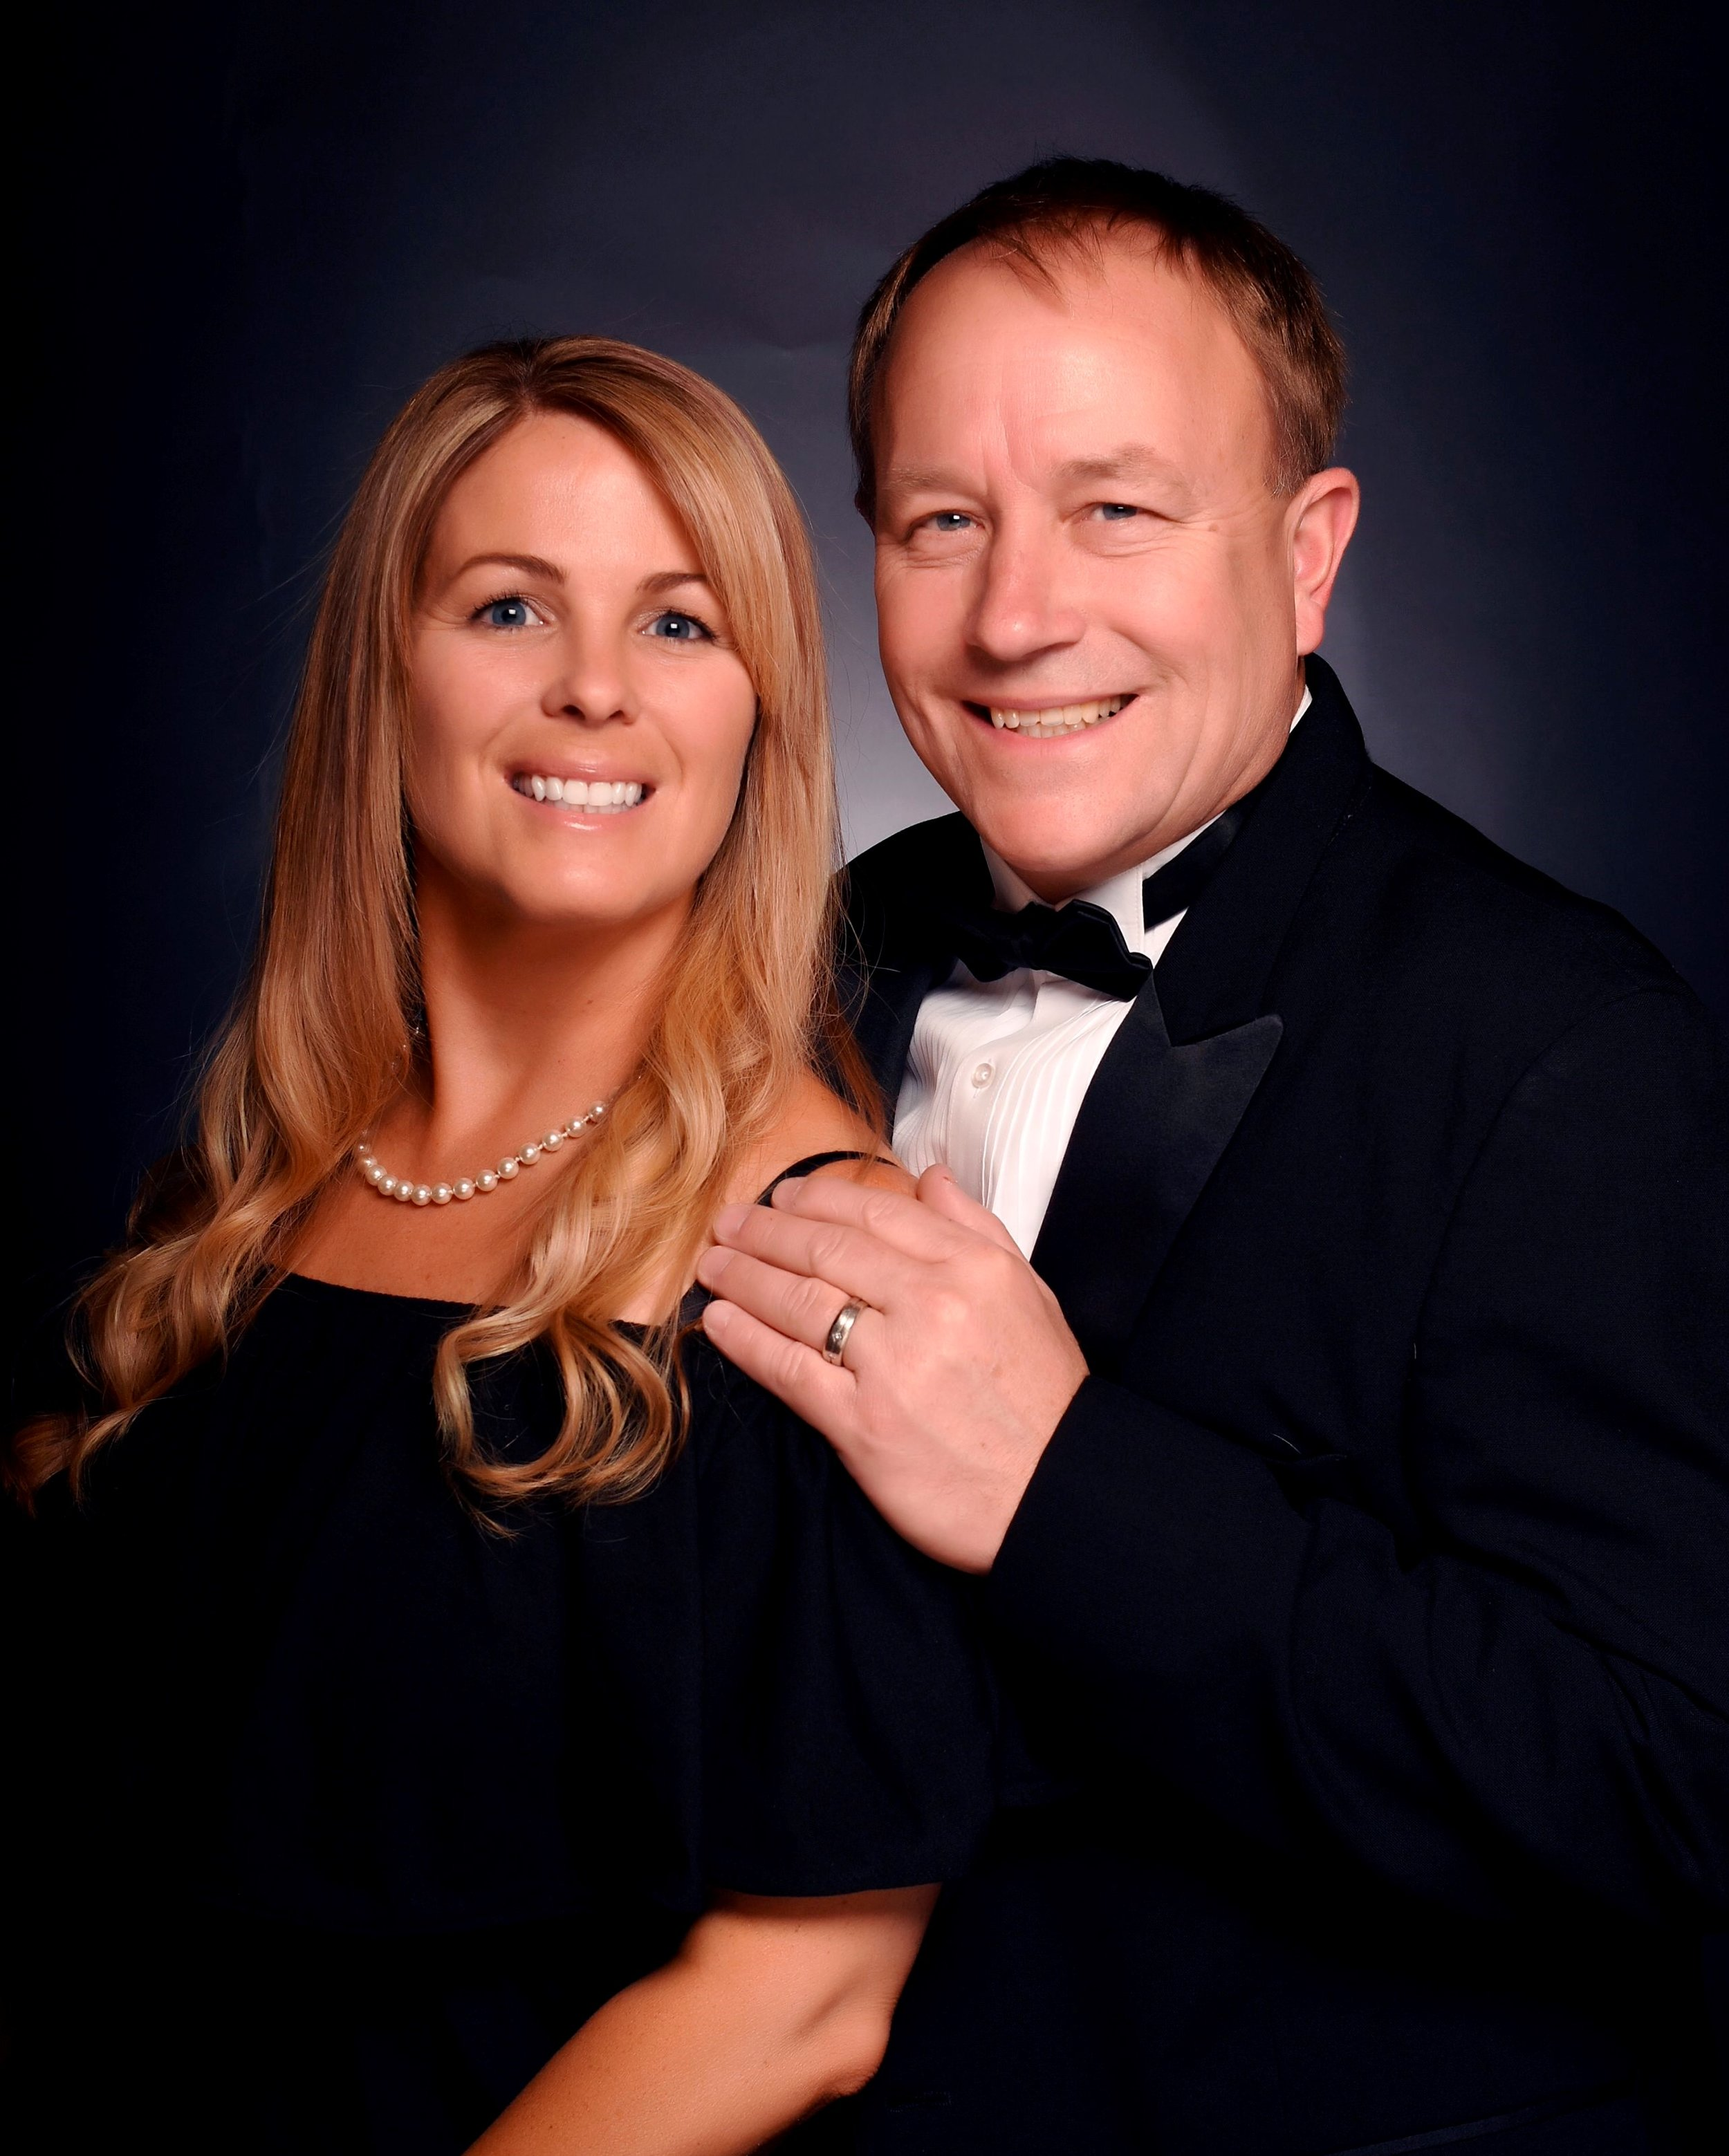 Mike and Kim Sherwin